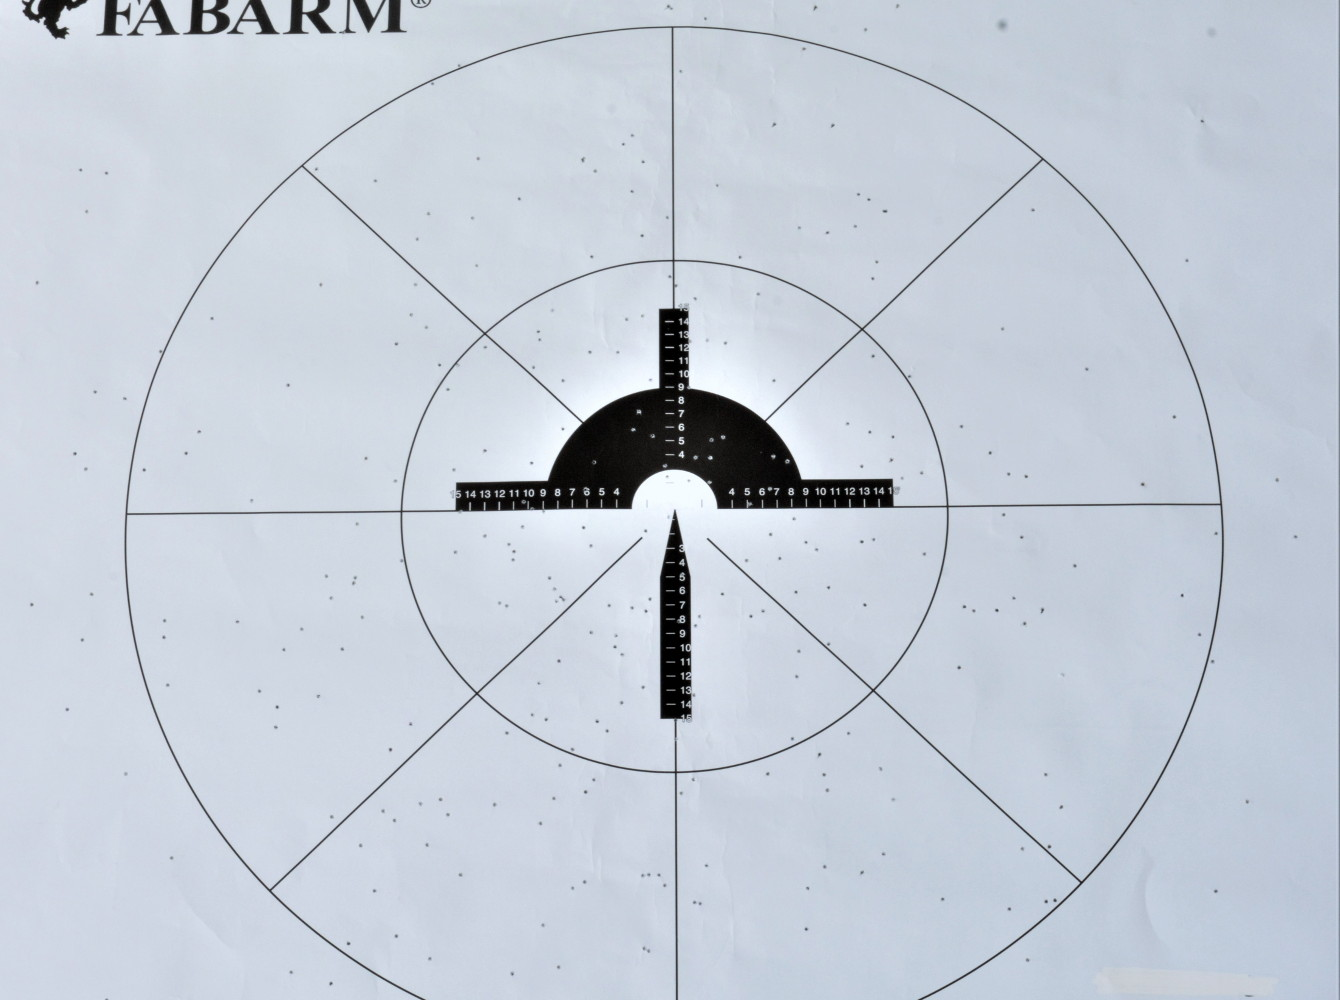 baschieri pellagri, prova di rosata a 35 metri col fucile fabarm xlr columba palumbus